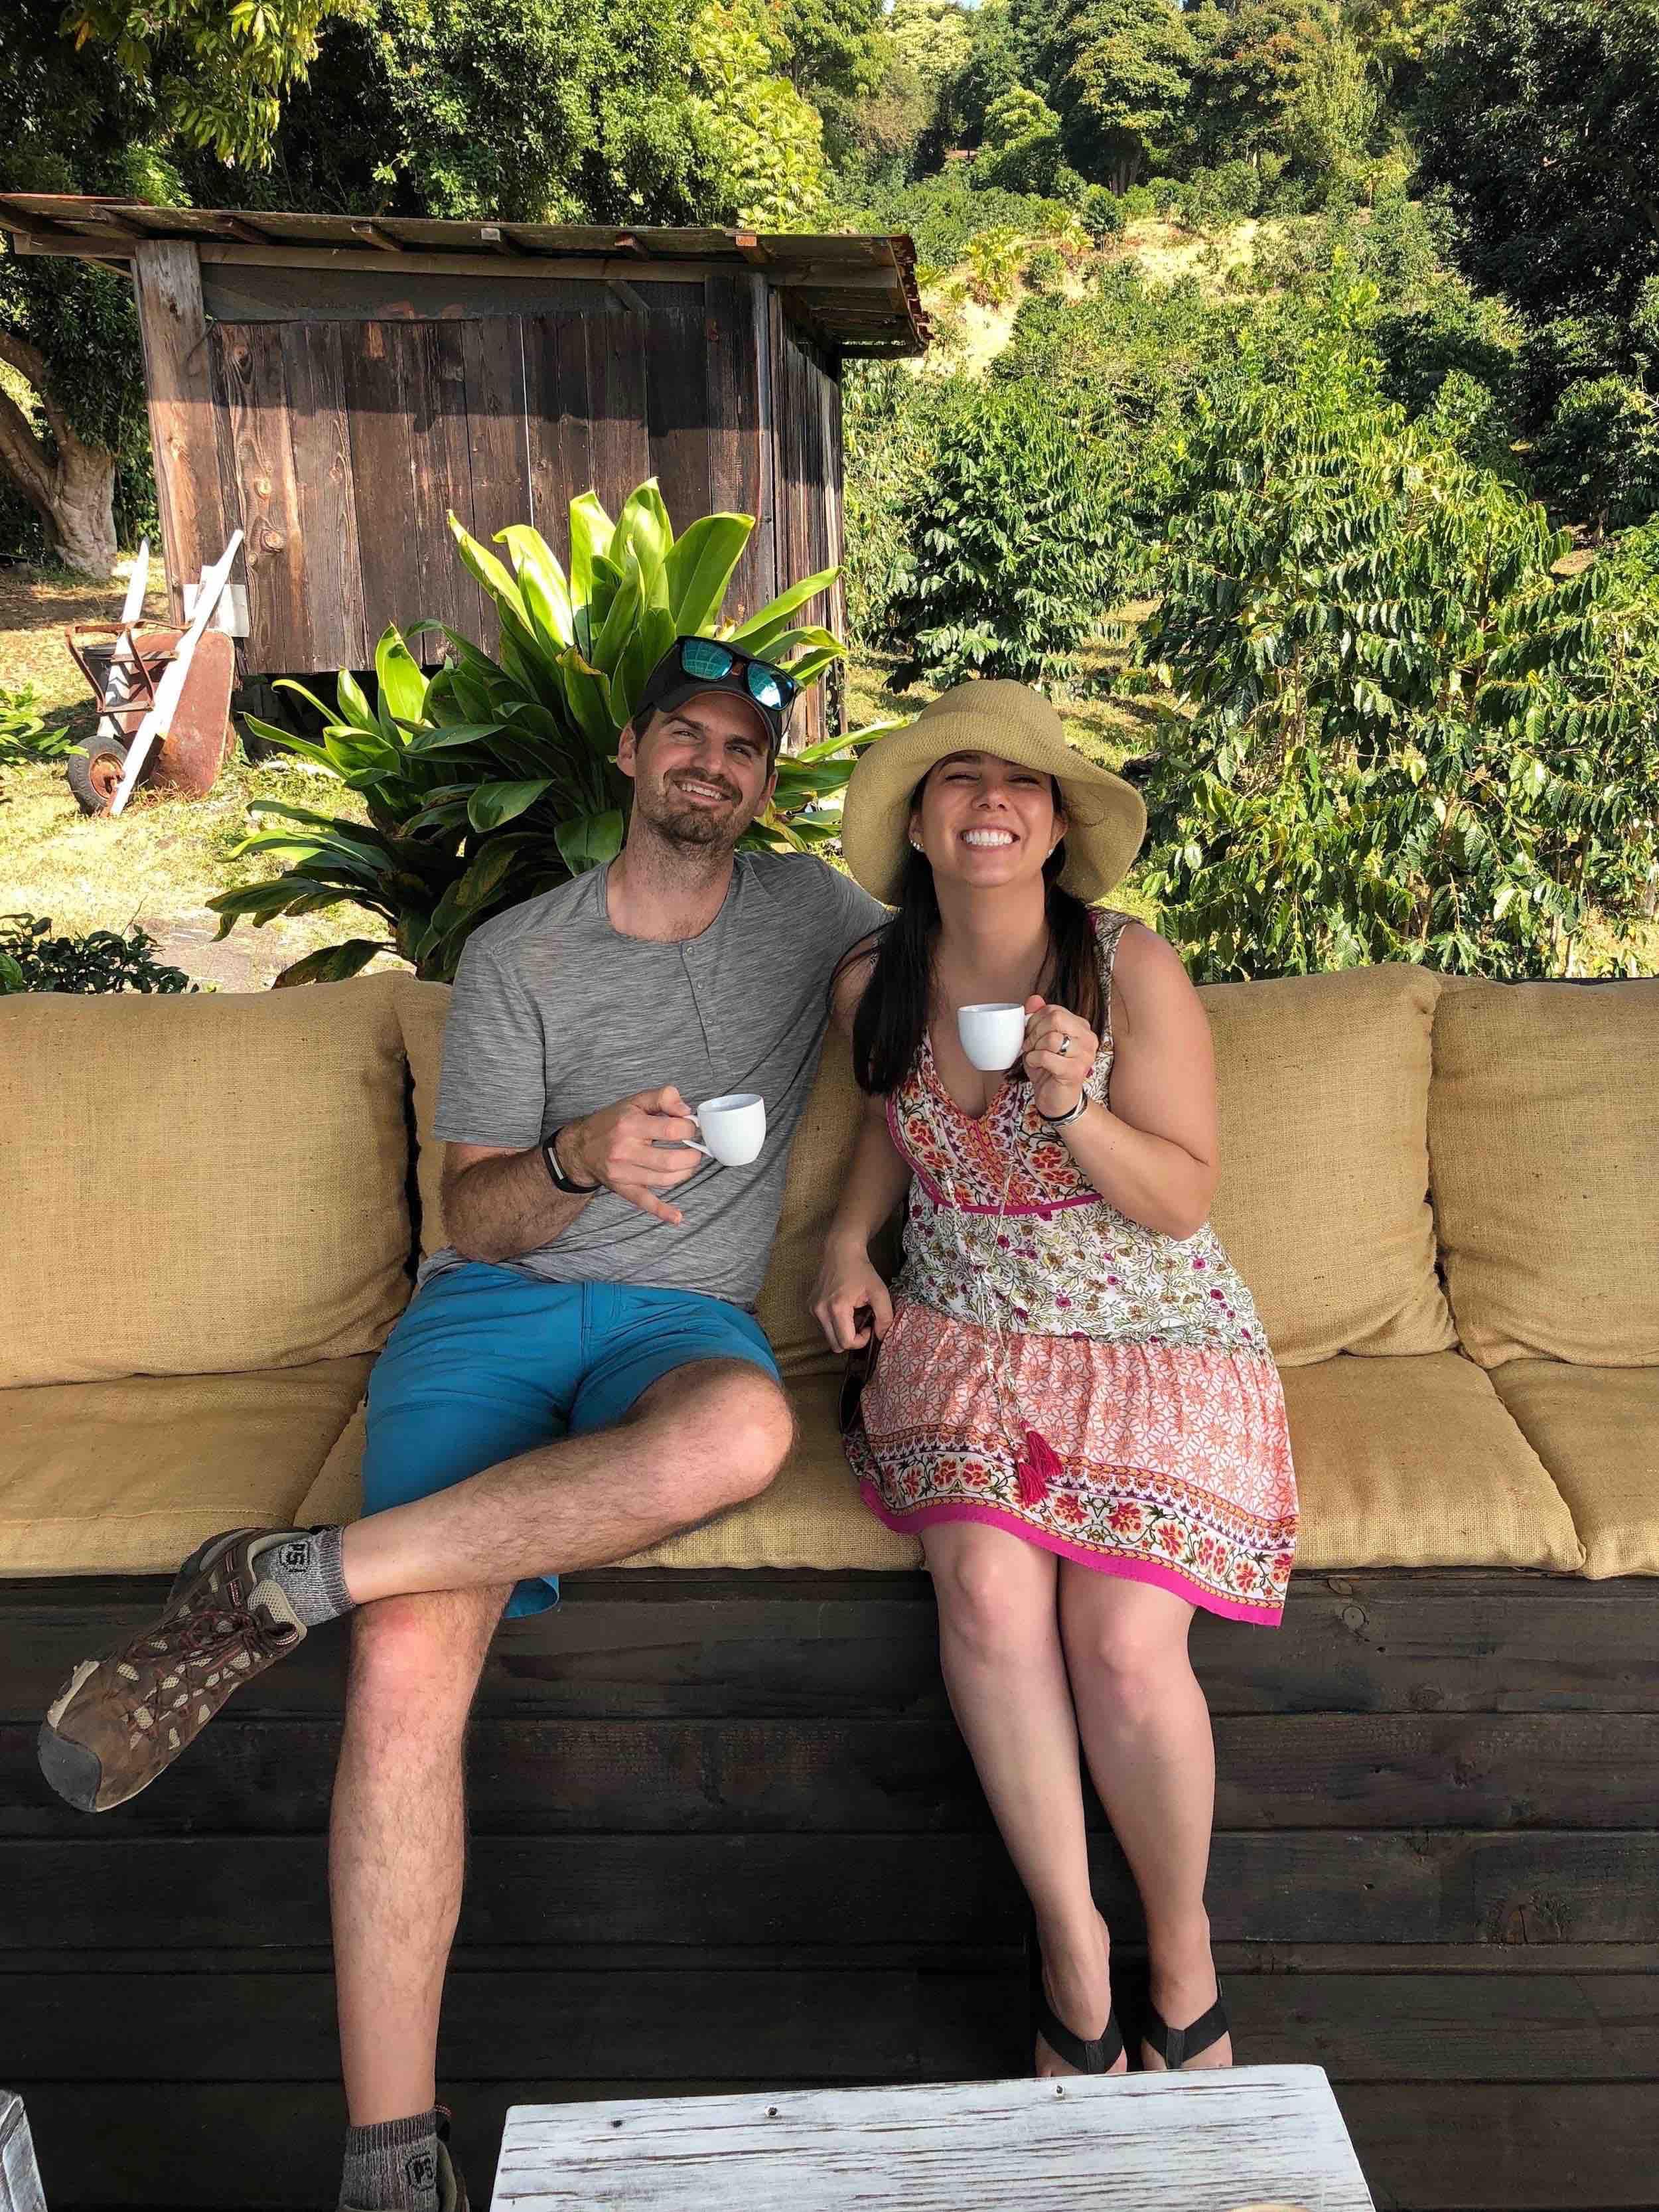 Couple enjoys Kona coffee tasting at Hala Tree in Kona, Hawaii.